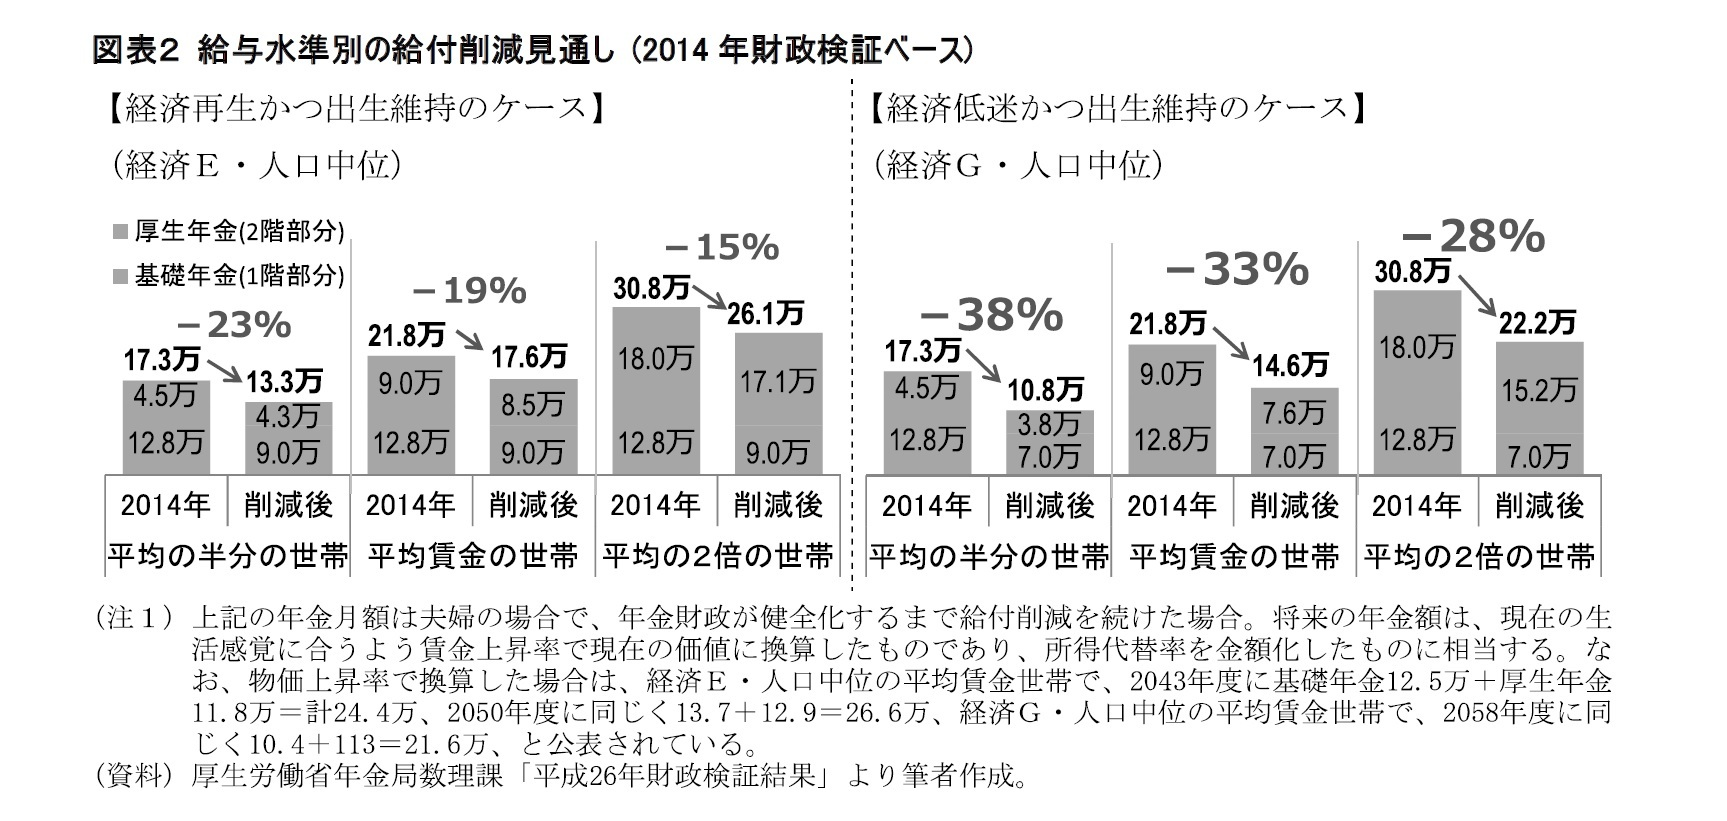 図表2 給与水準別の給付削減見通し (2014年財政検証ベース)